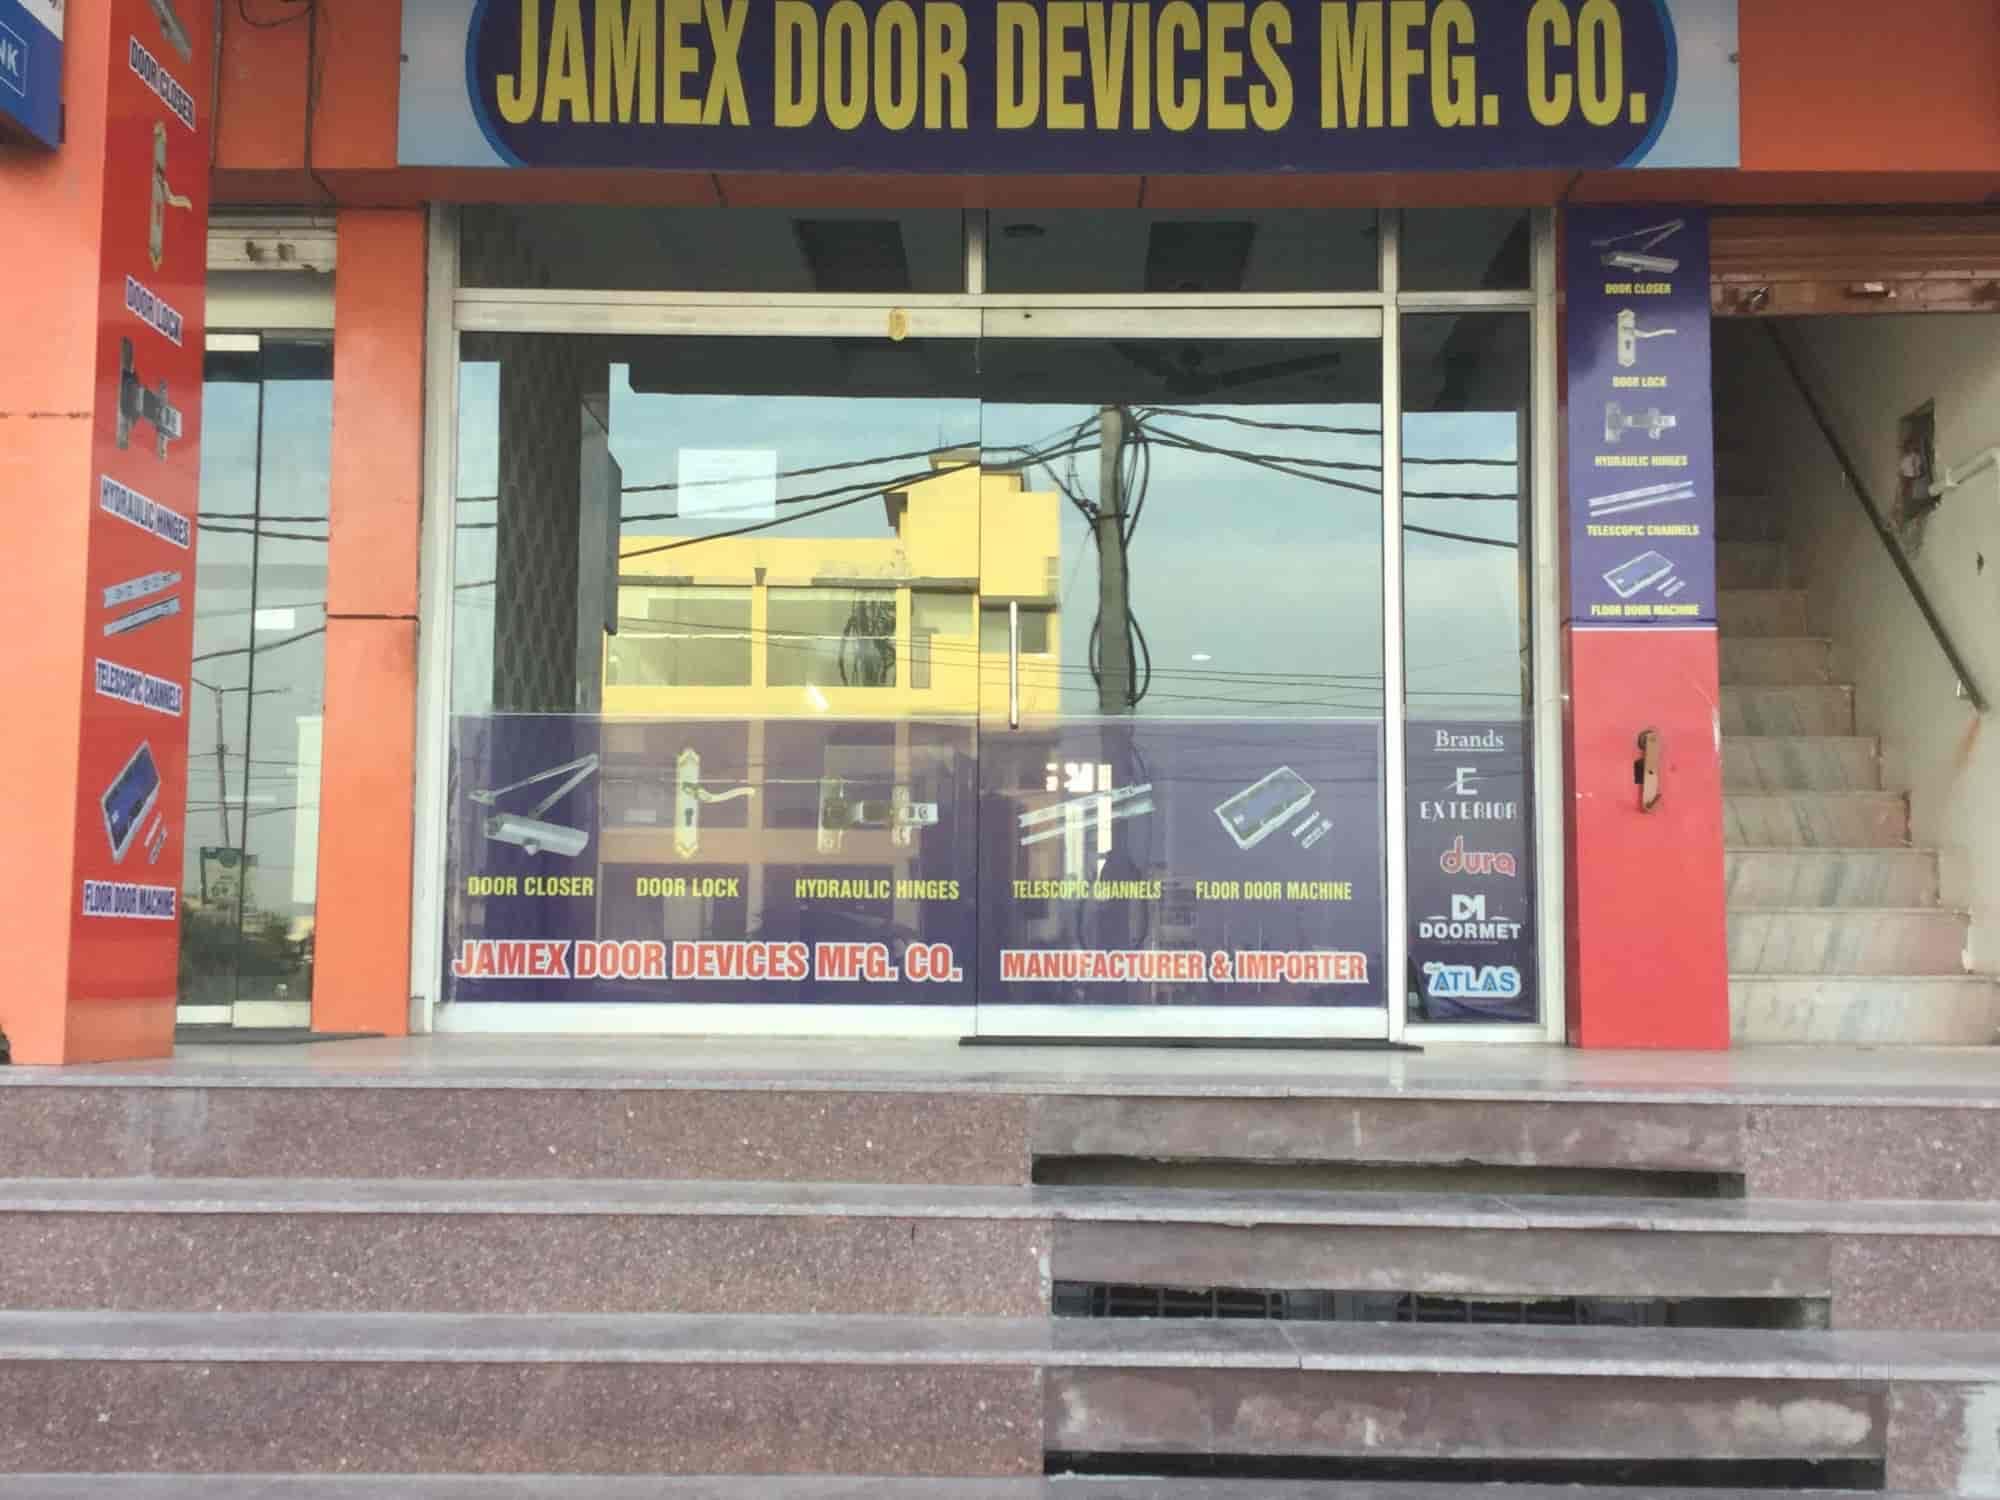 JAMEX DOOR Devices Mfg. Co. Kharar - Hardware Dealers in Chandigarh - Justdial & JAMEX DOOR Devices Mfg. Co. Kharar - Hardware Dealers in ...